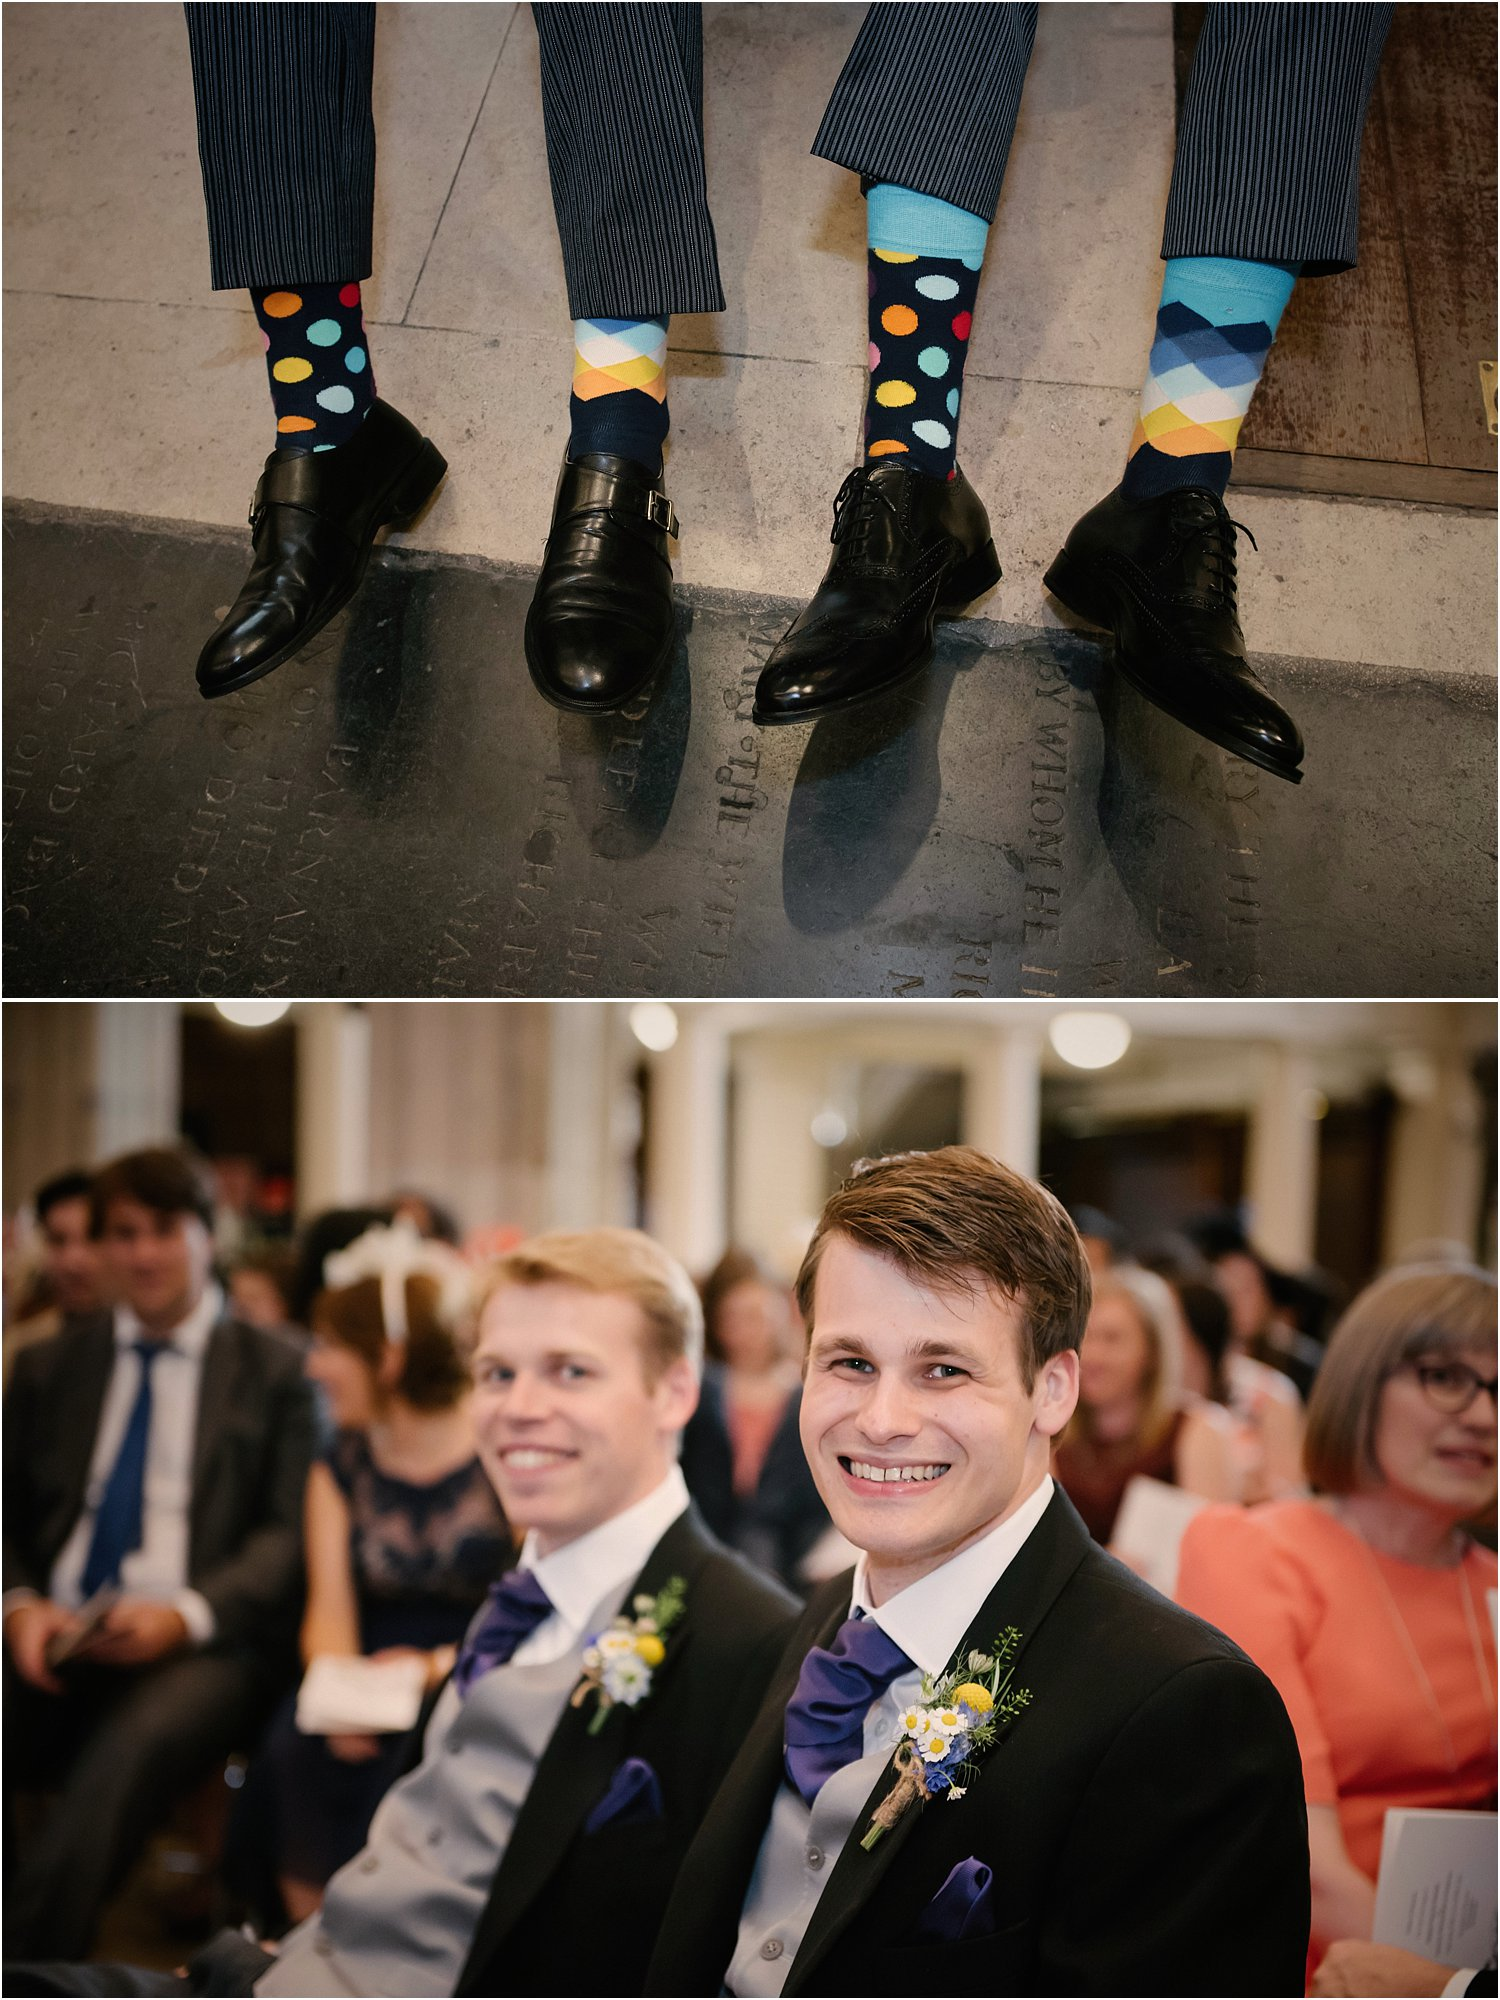 city-of-london-wedding-nim-abi-baniking-hall-lily-sawyer-photo